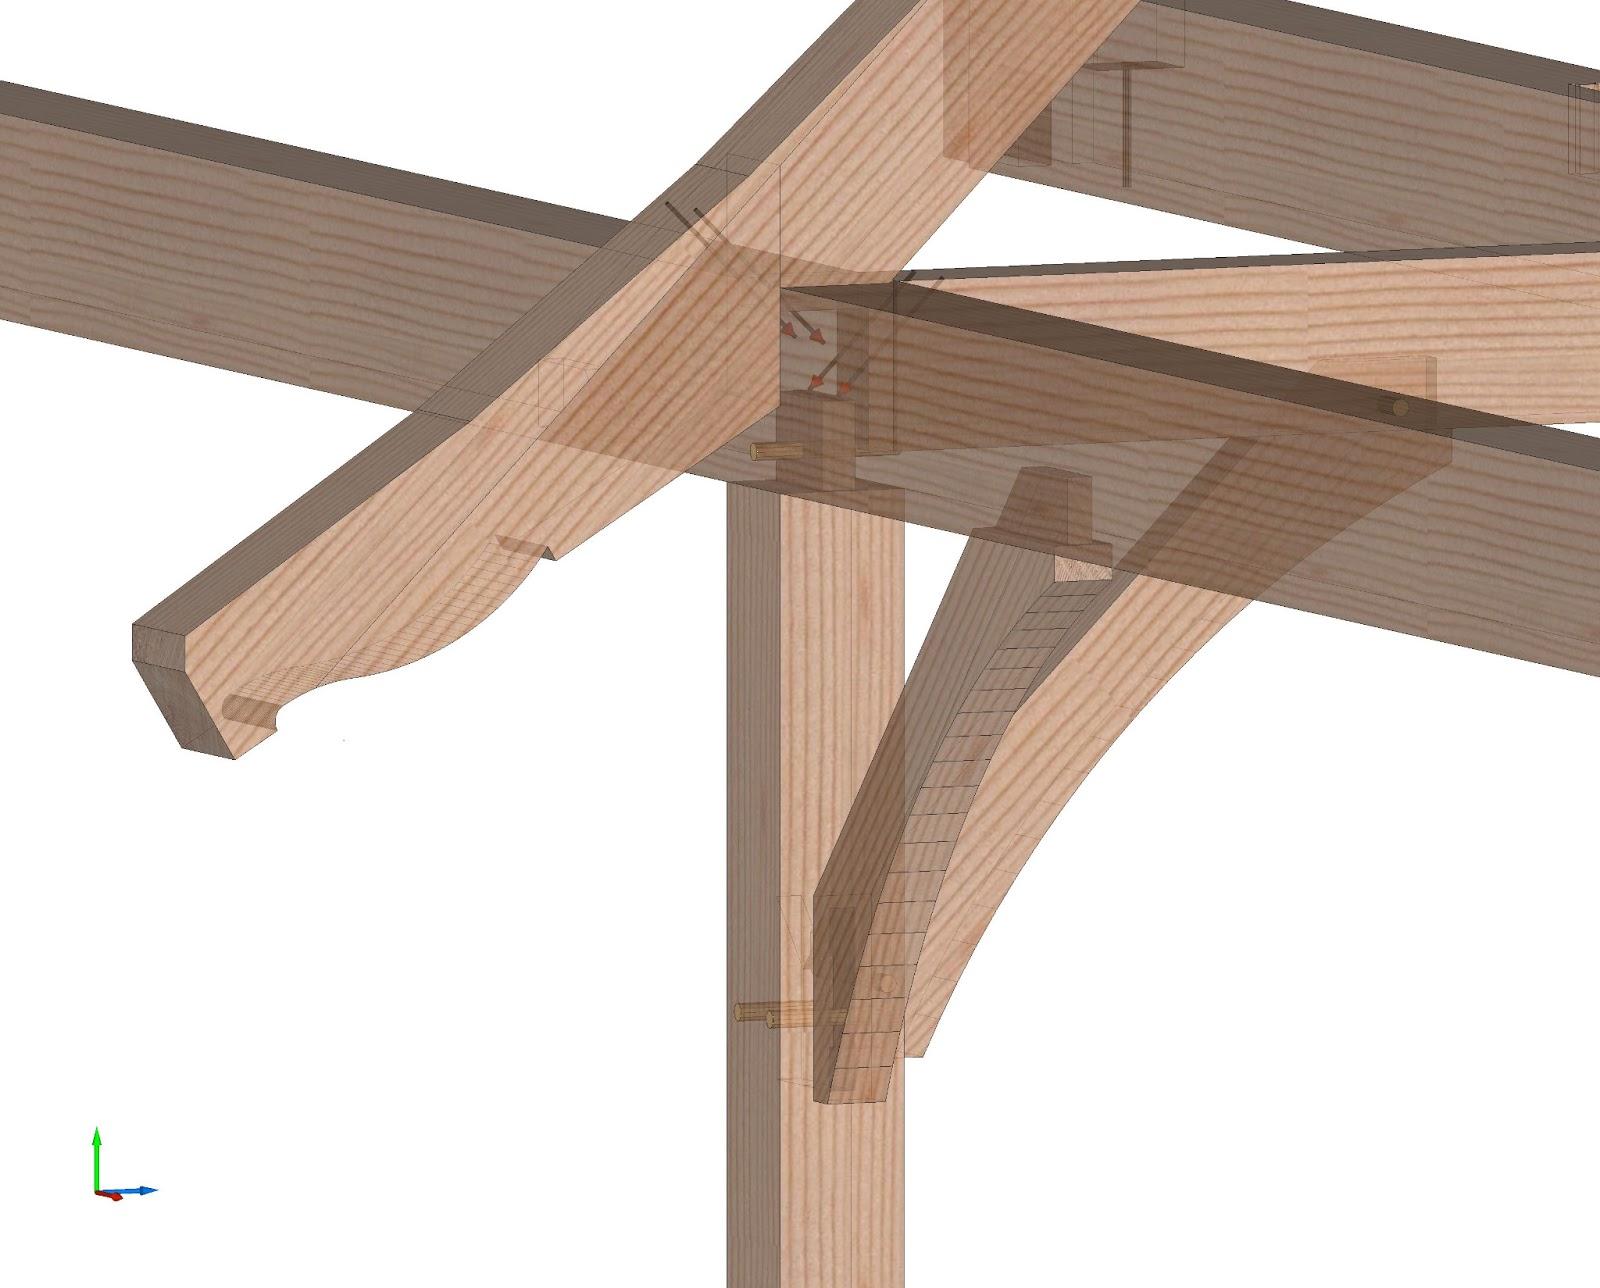 Timber Frame Design January 2013